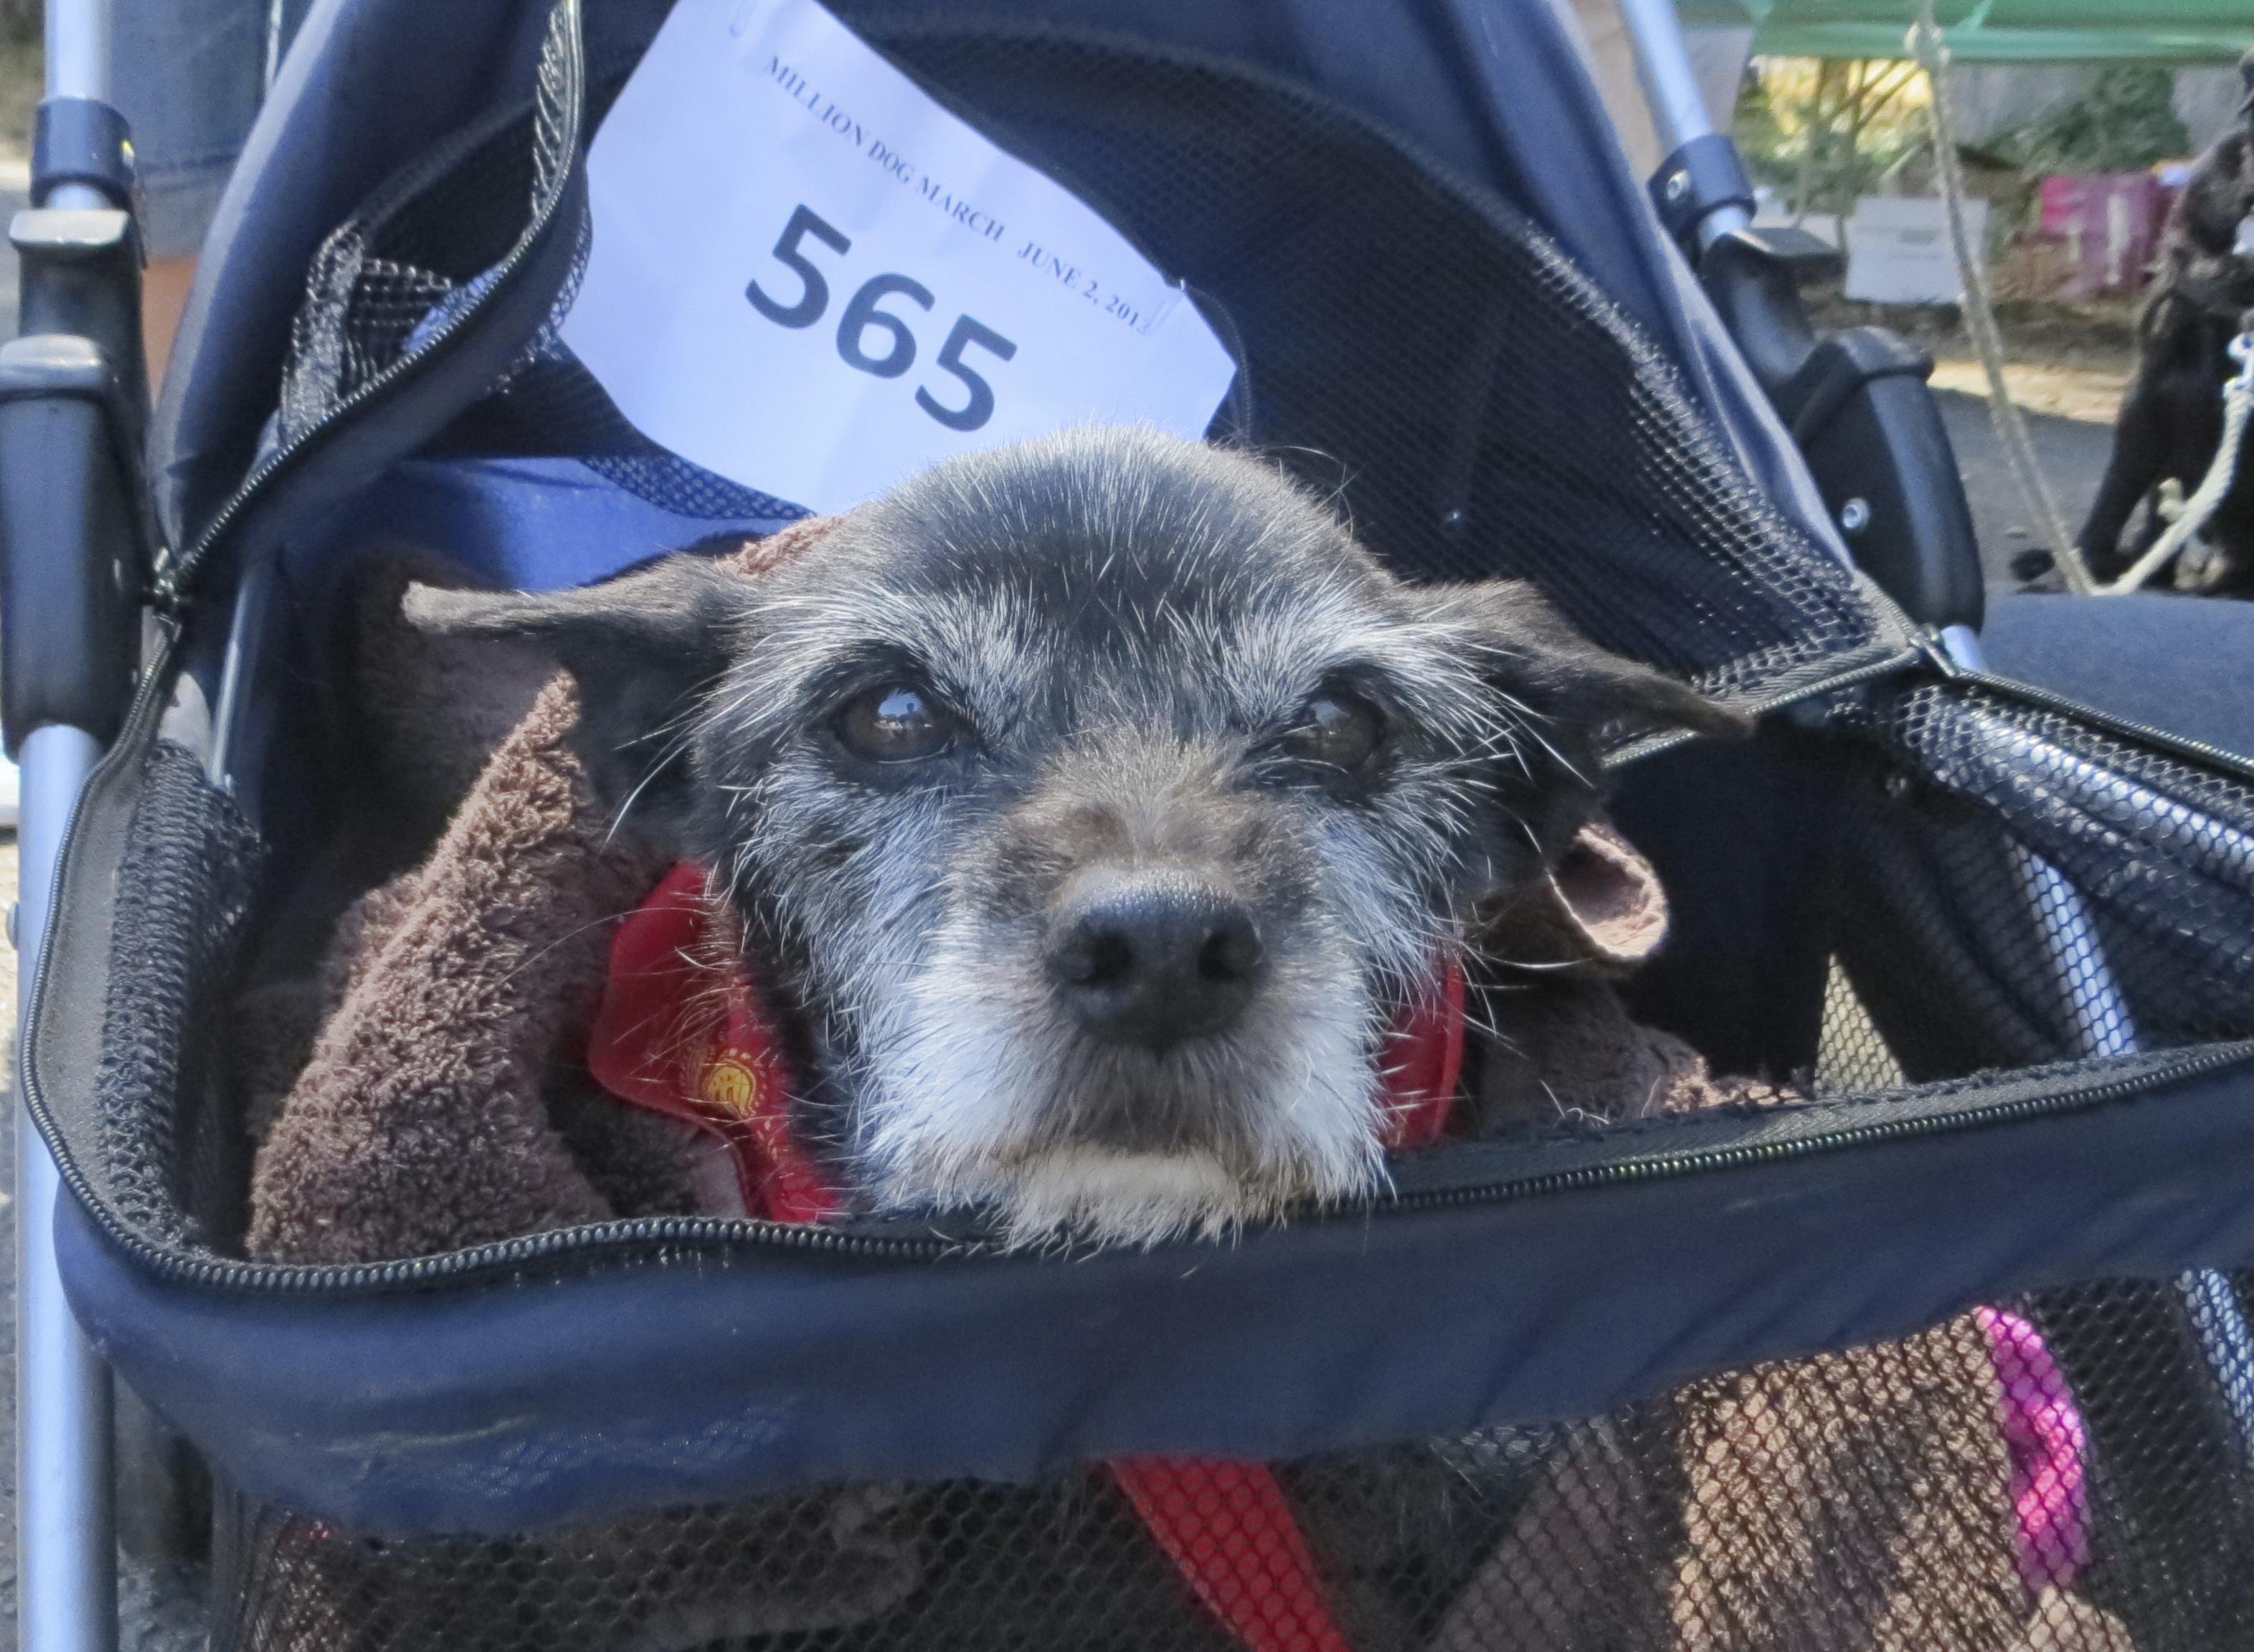 Terrier in Stroller